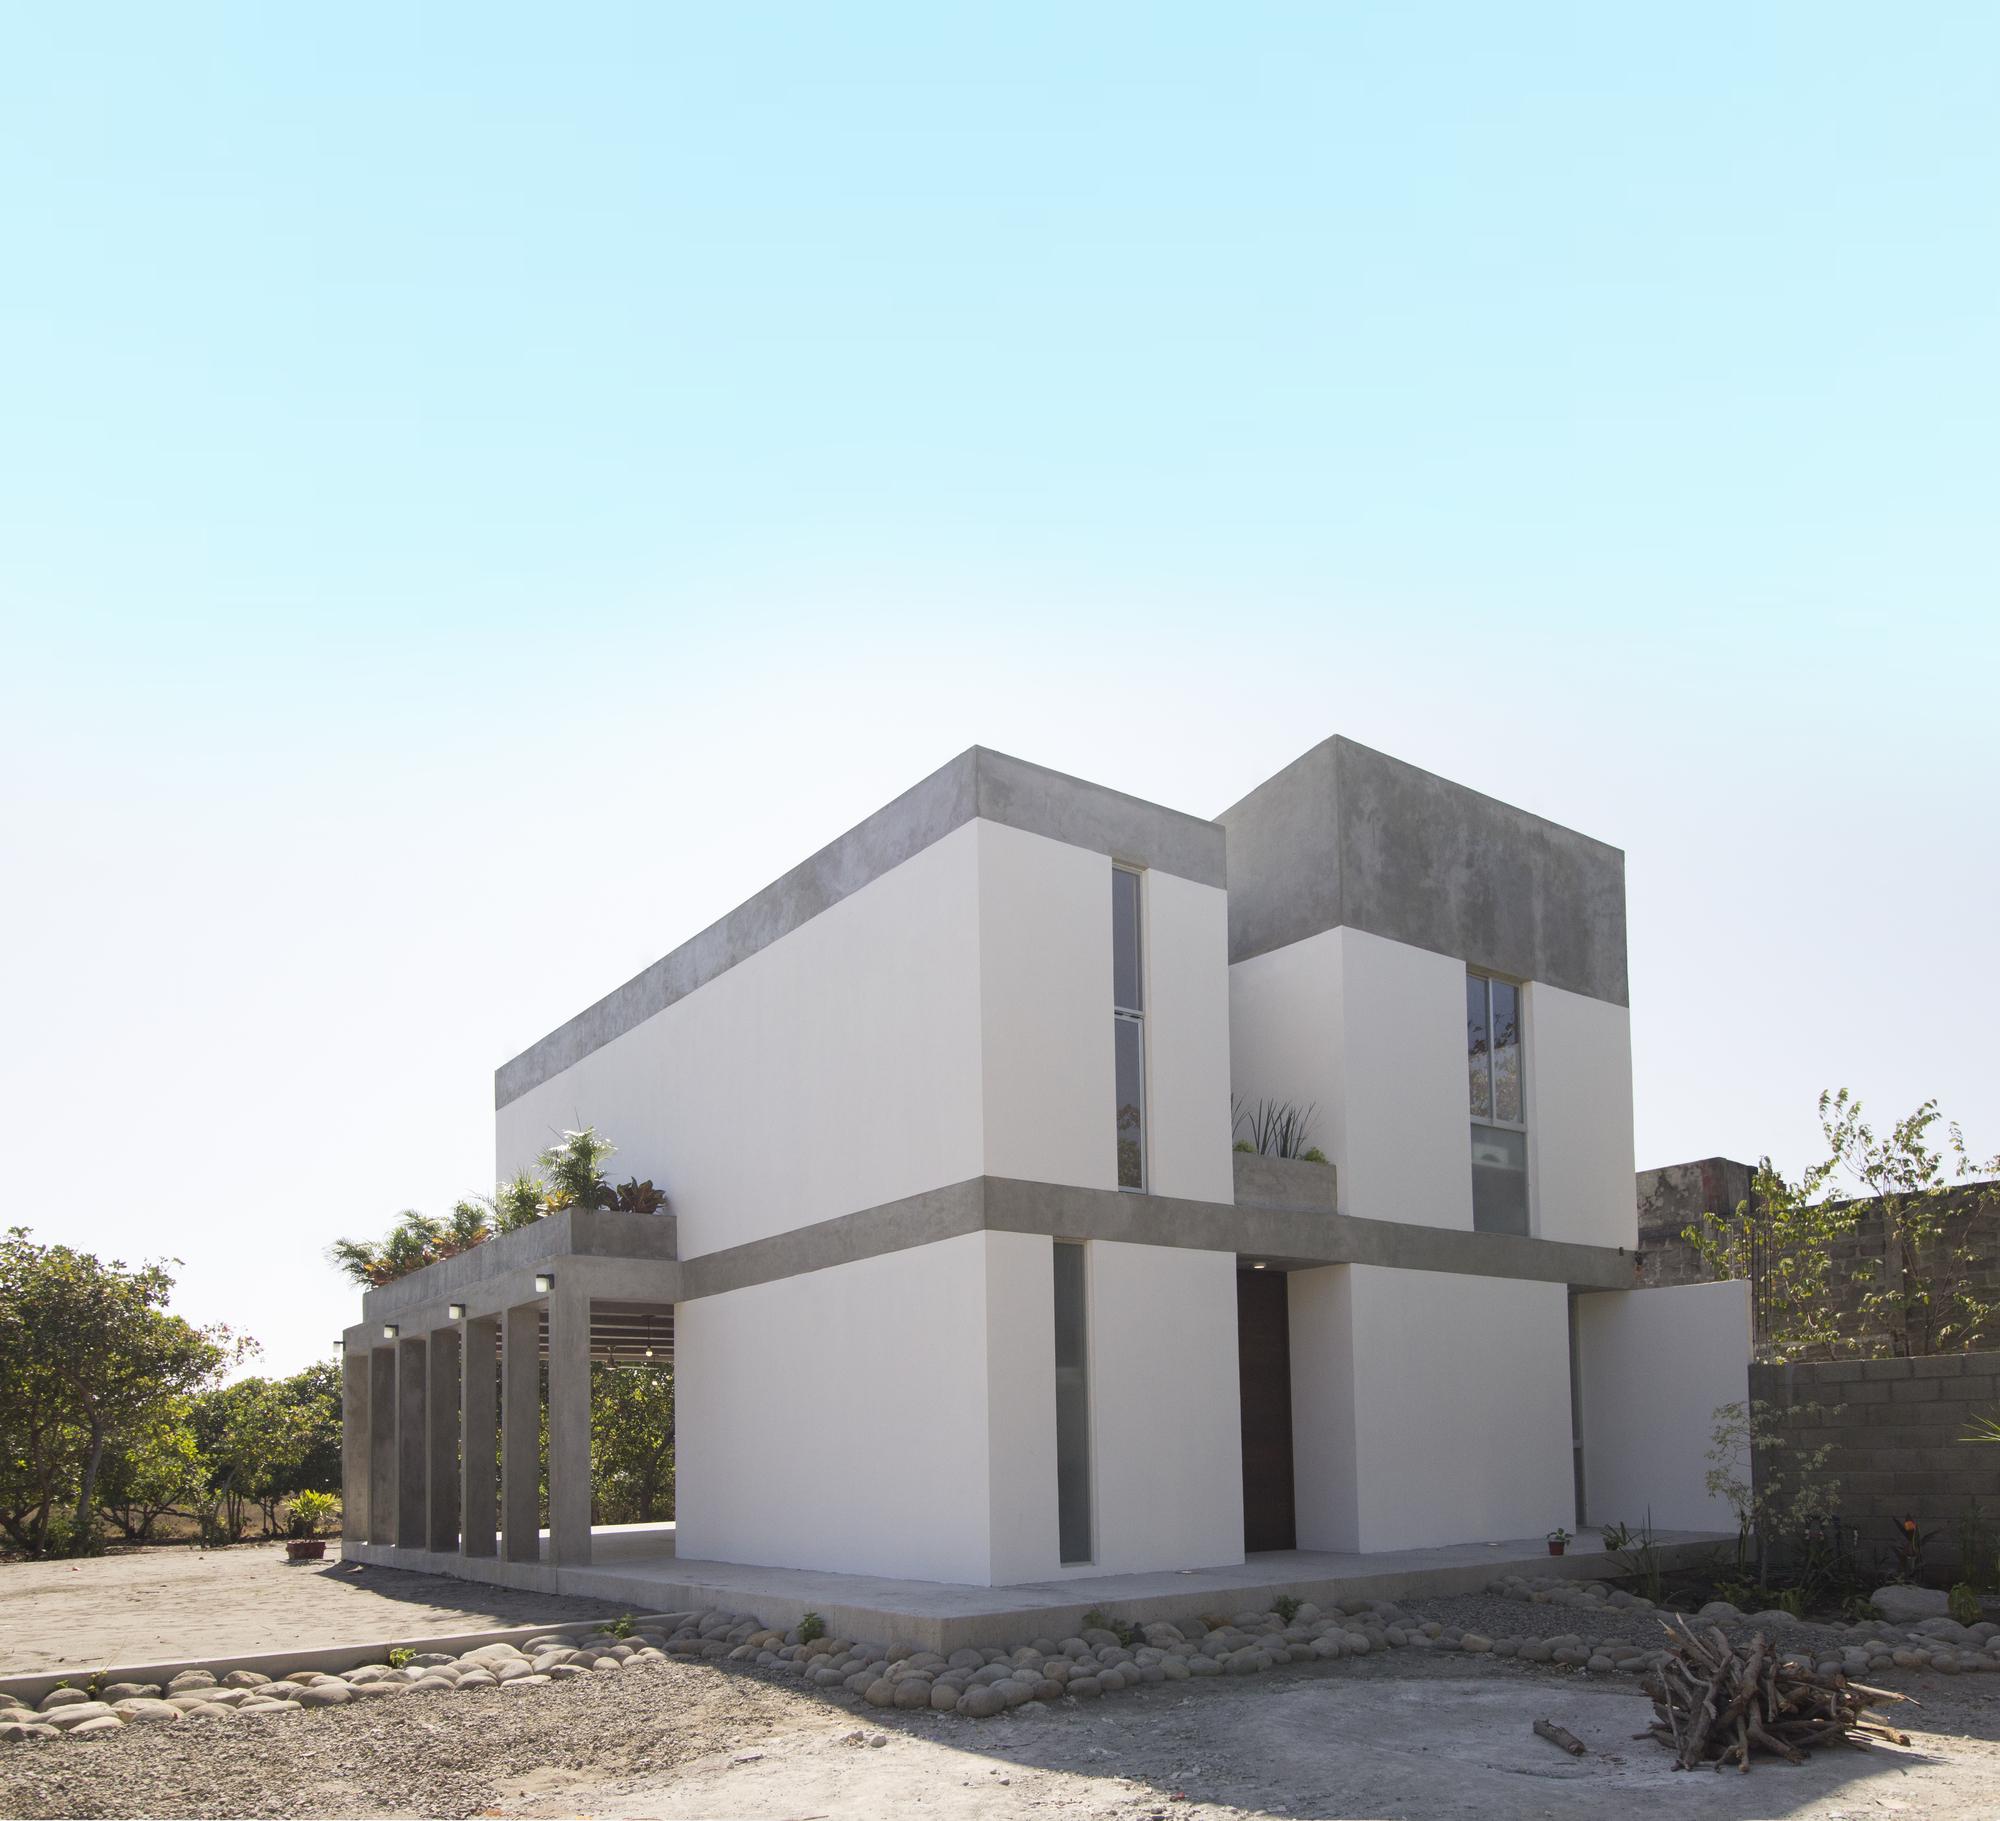 Galer a de casa mida apaloosa estudio de arquitectura y for Estudio de arquitectura